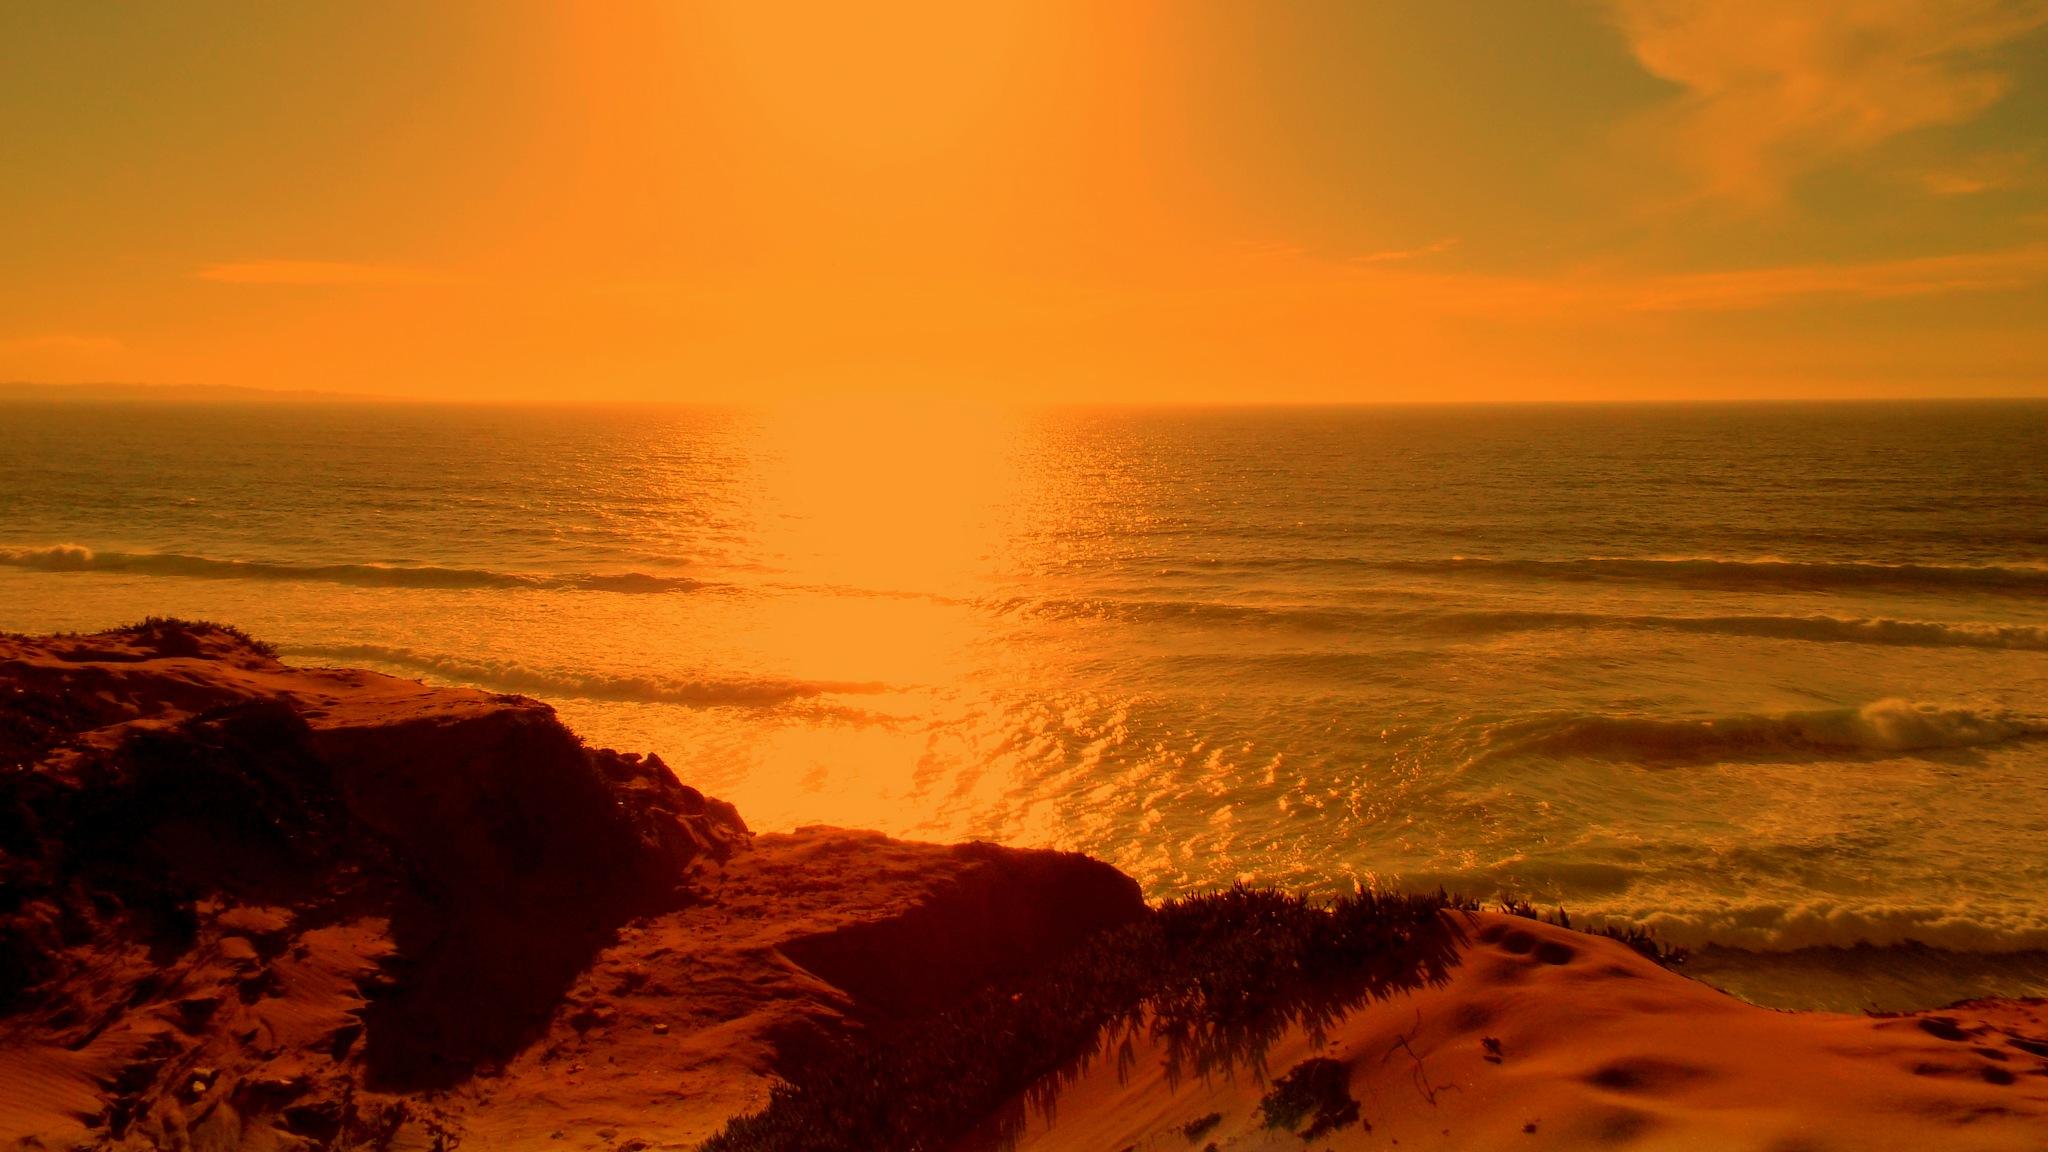 PACIFIC OCEAN SUNSET, FULL SCREEN by Akin Saner